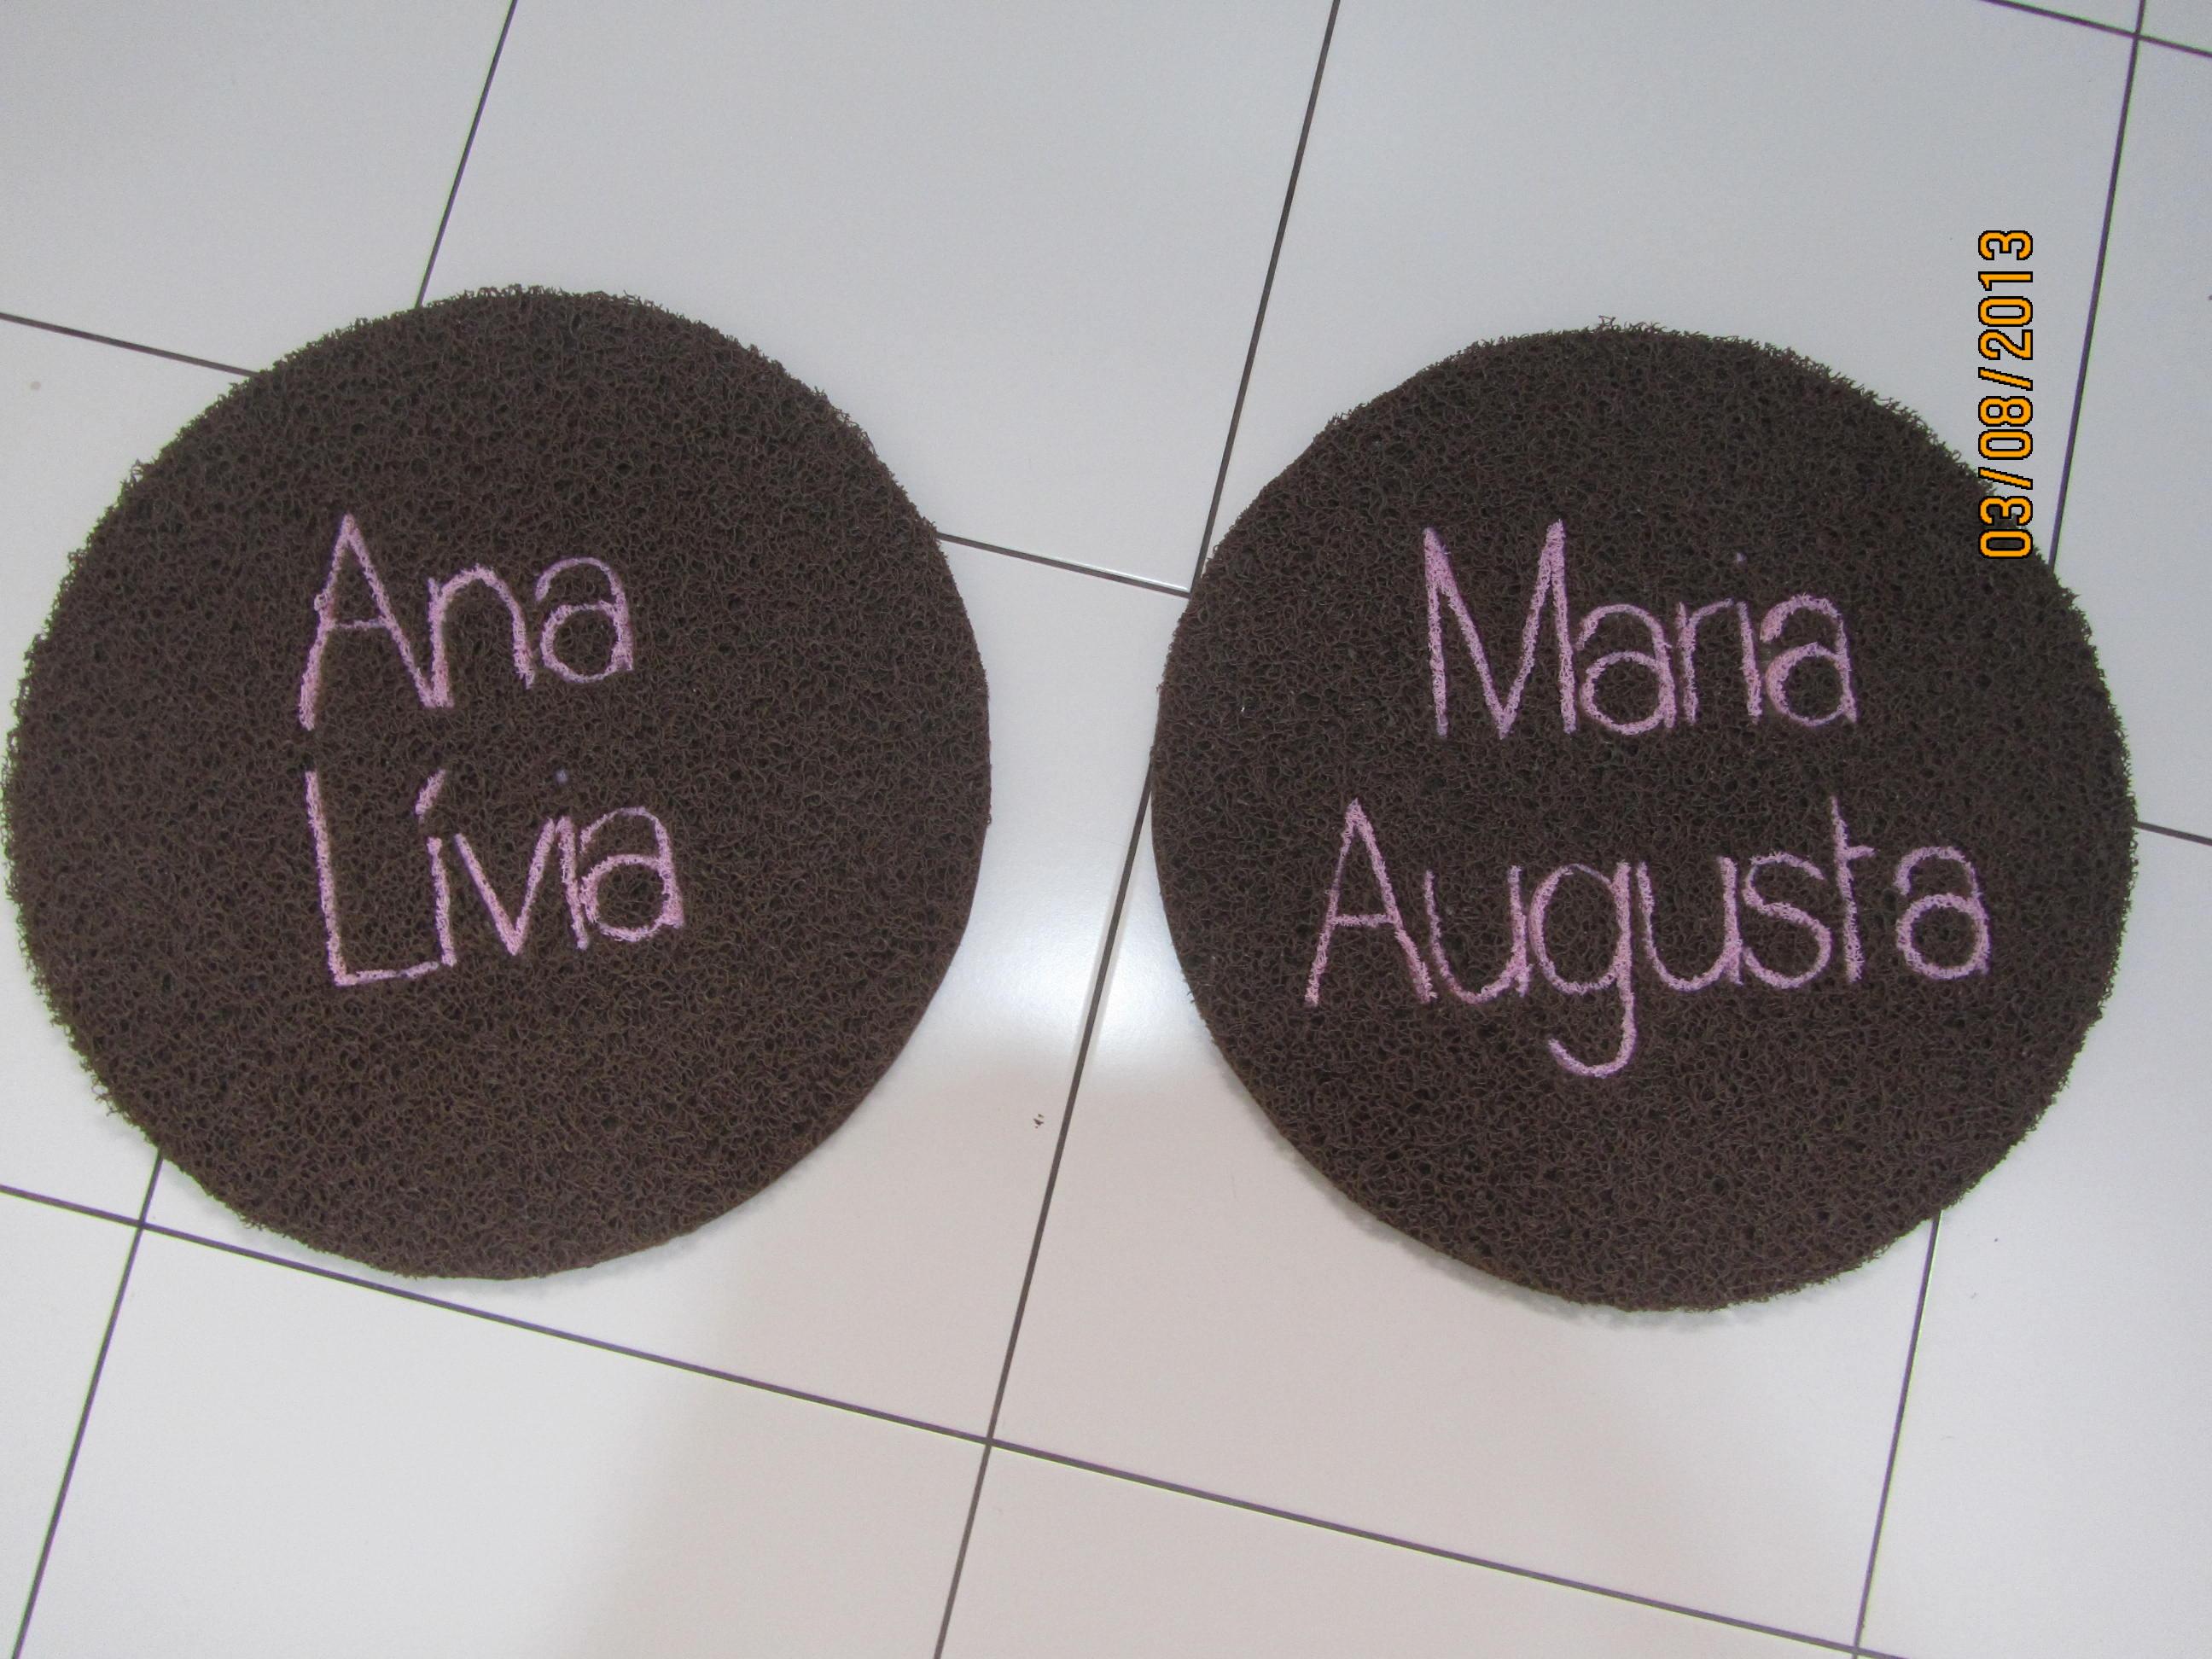 Ana Lívia e Maria Augusta